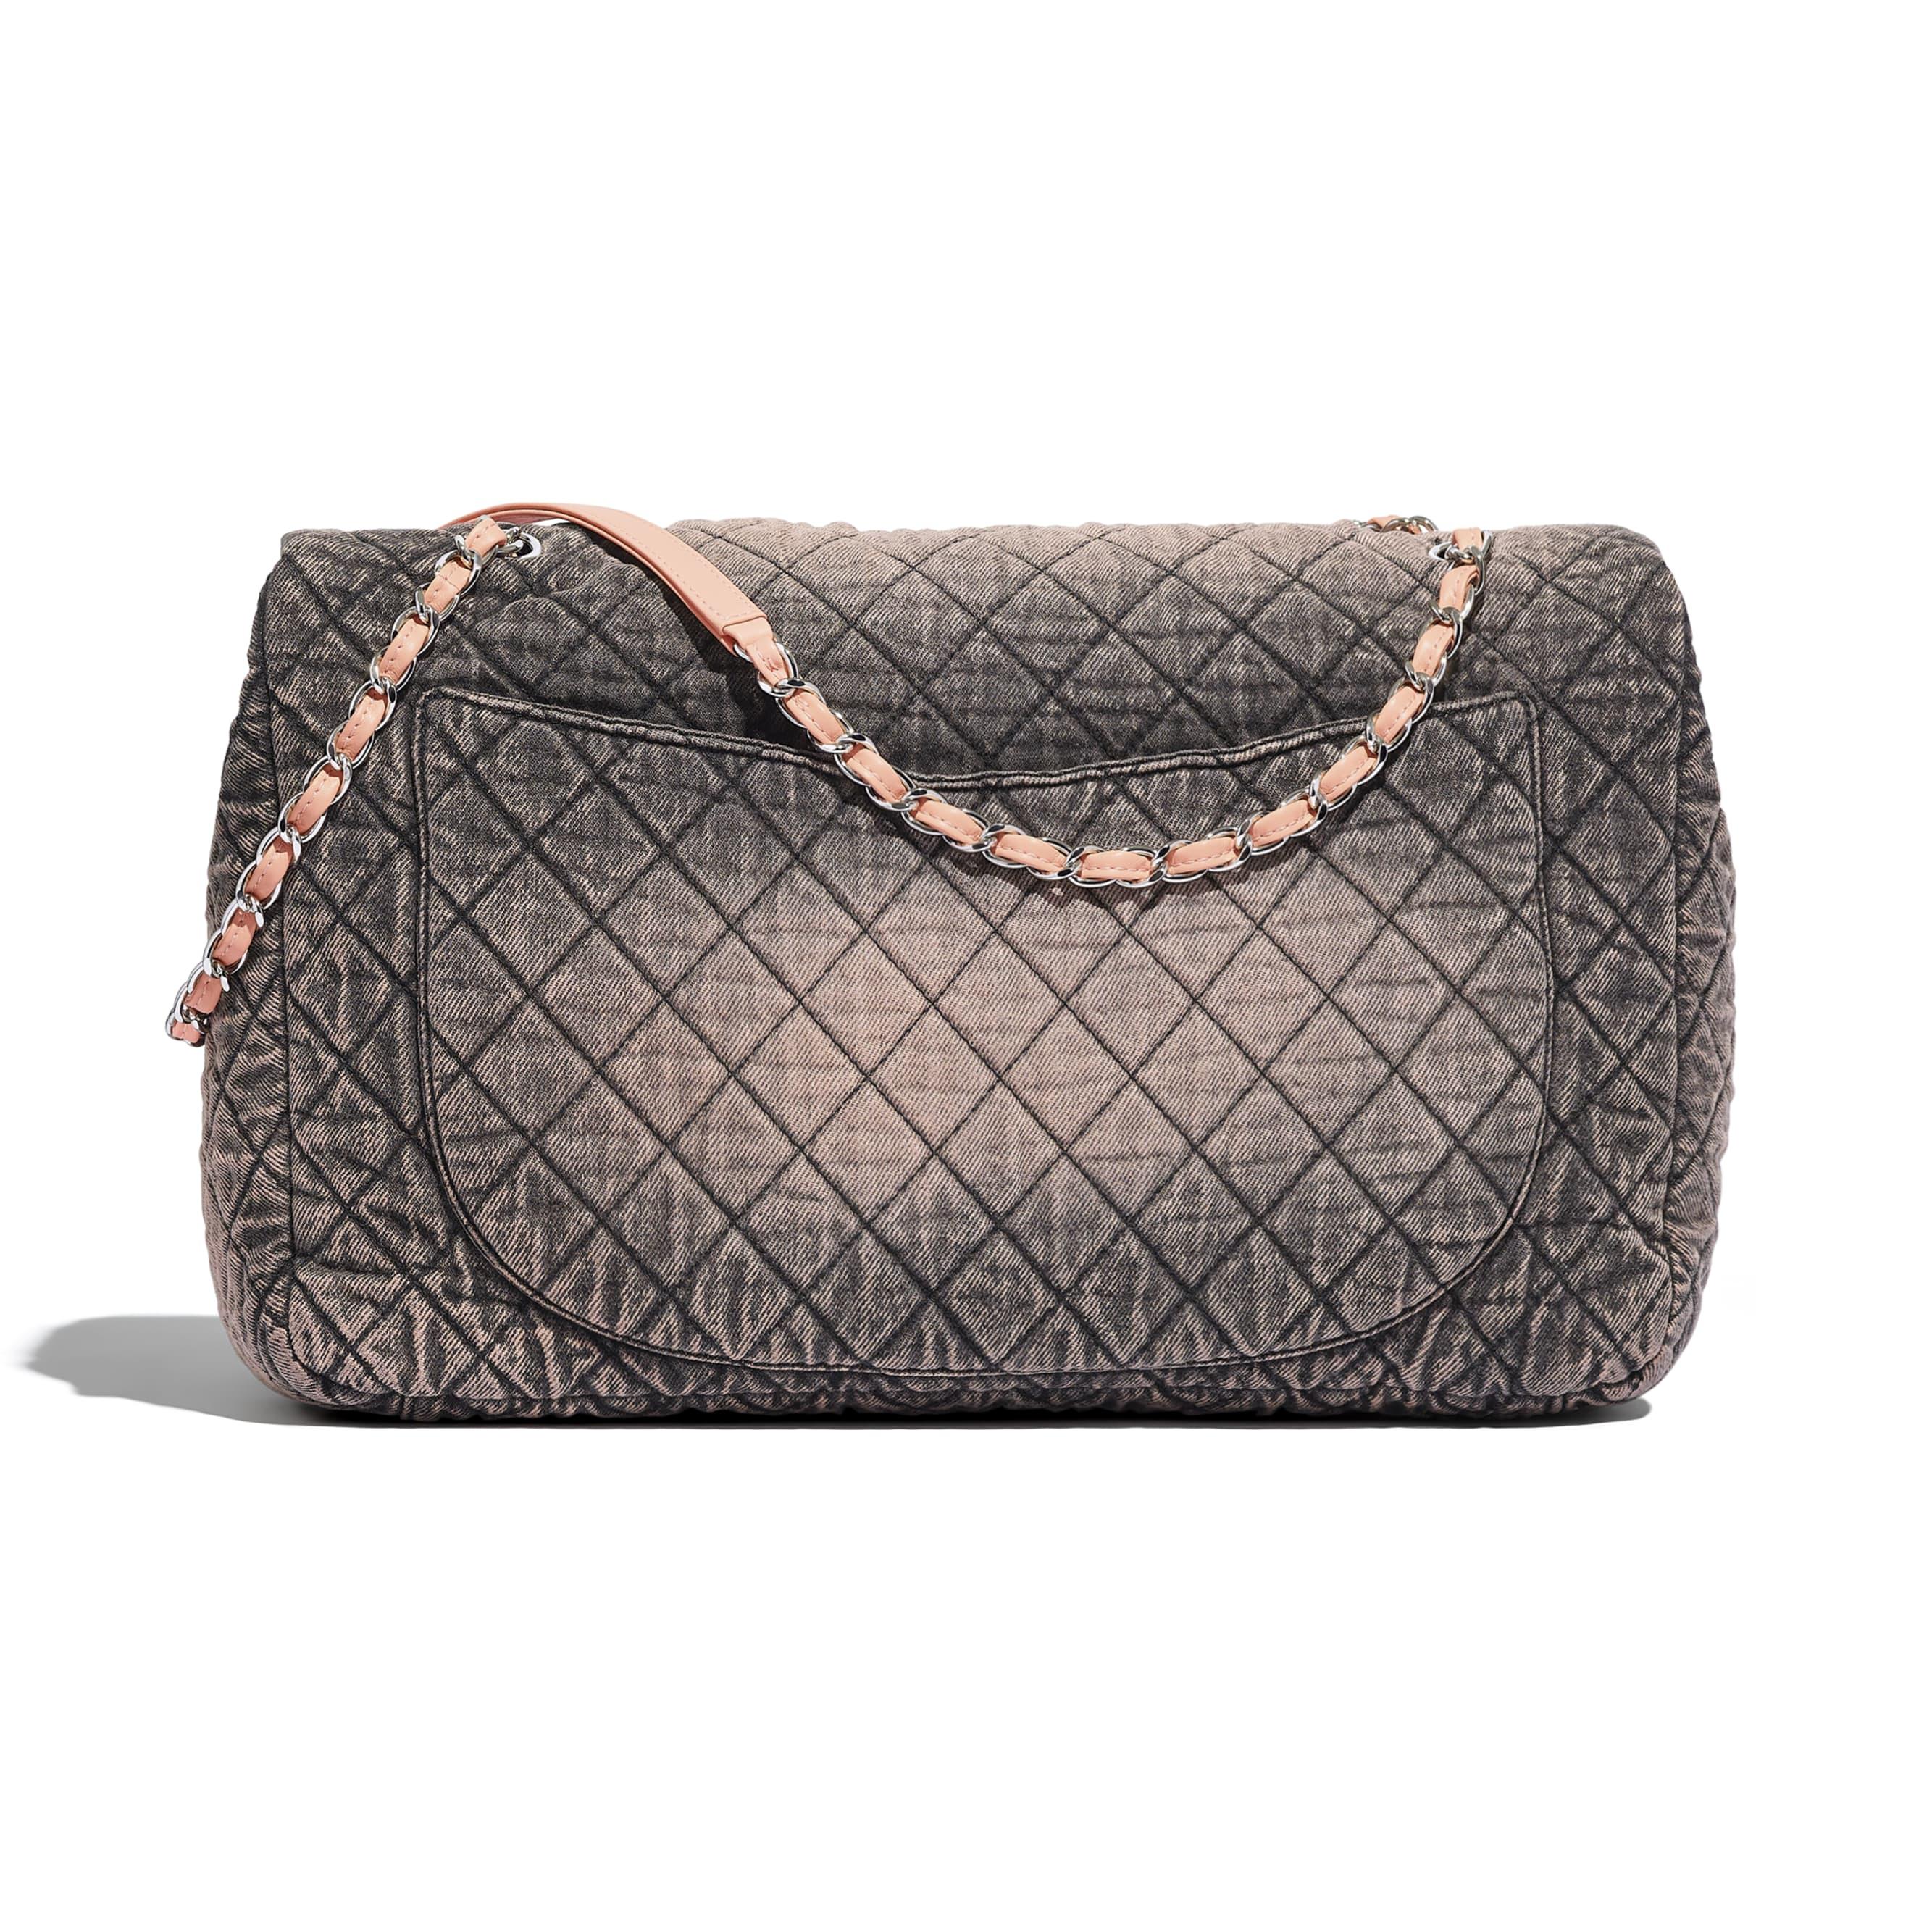 Large Flap Bag - Light Pink & Black - Denim & Silver-Tone Metal - Alternative view - see standard sized version